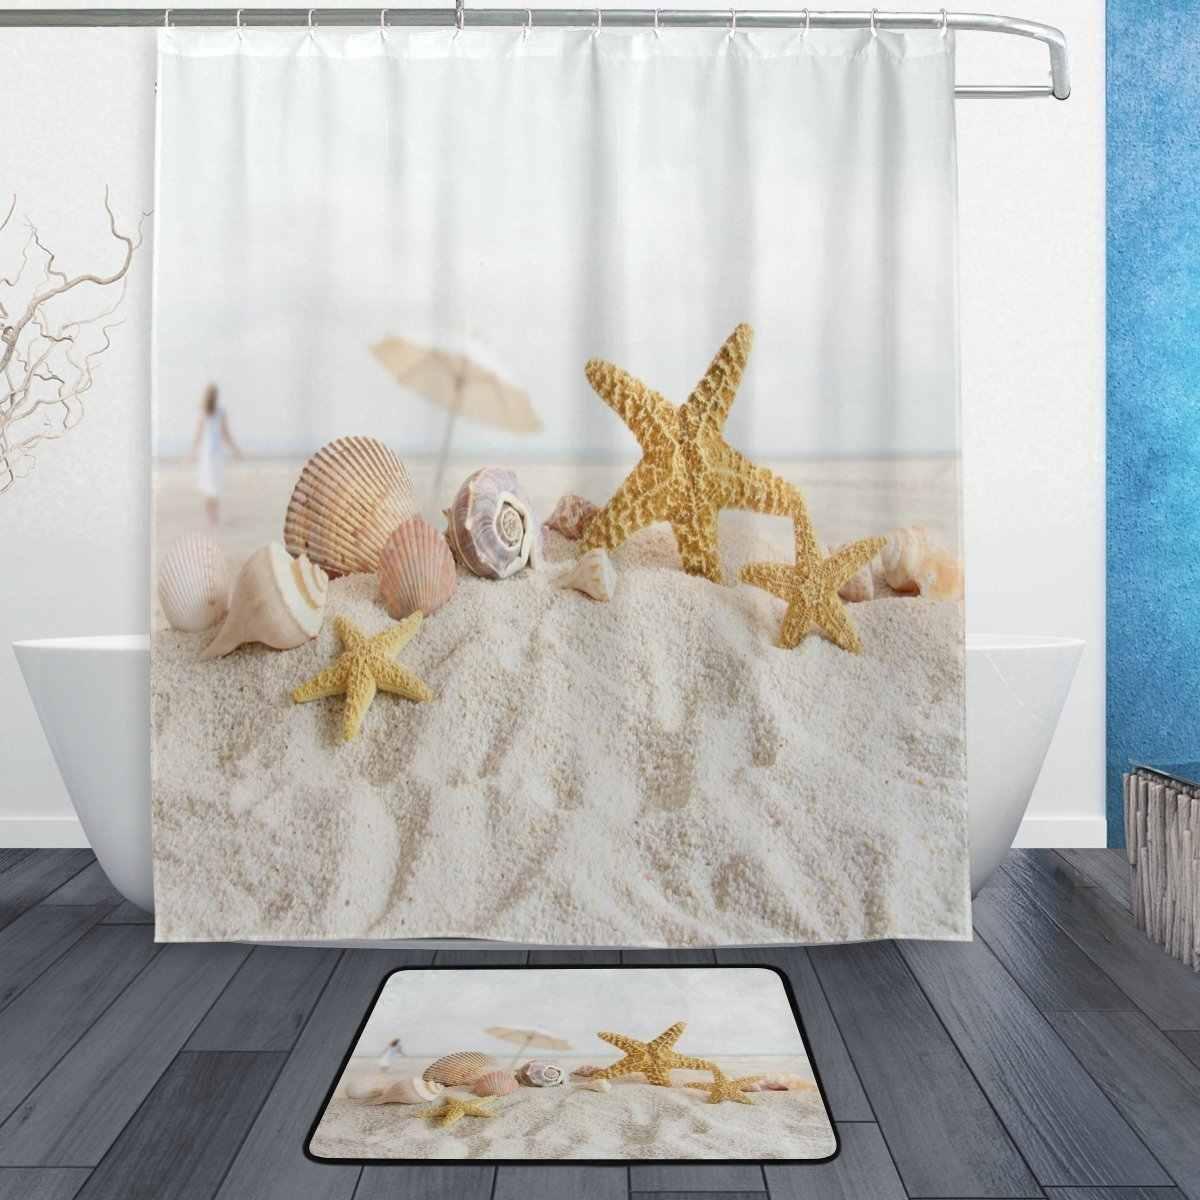 Ocean Beach Sea Theme Shower Curtain And Mat Set Starfish